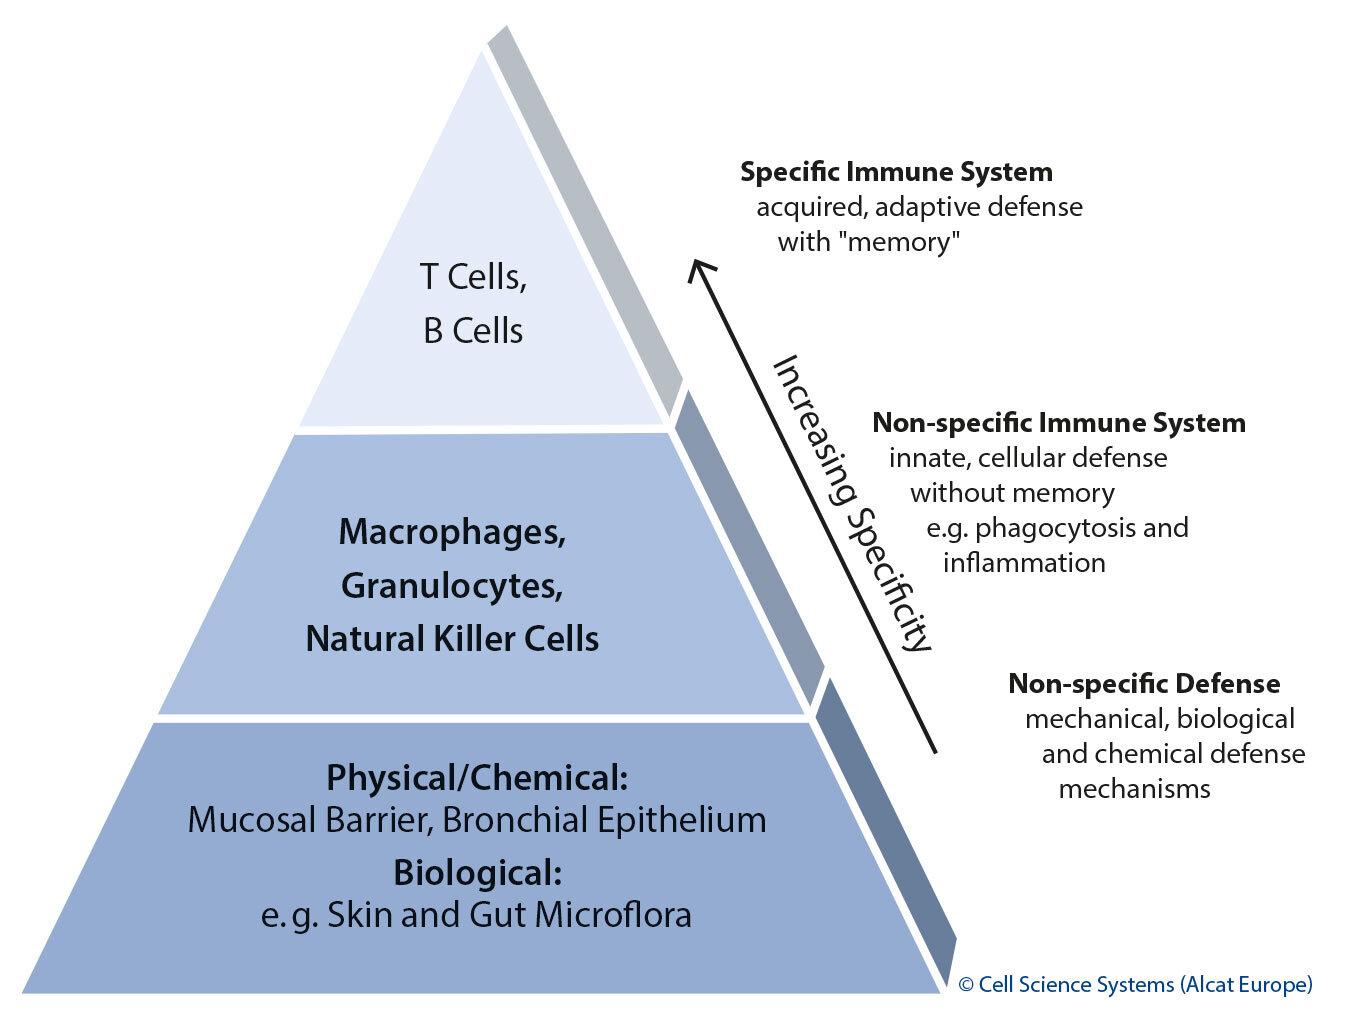 Structure immune system